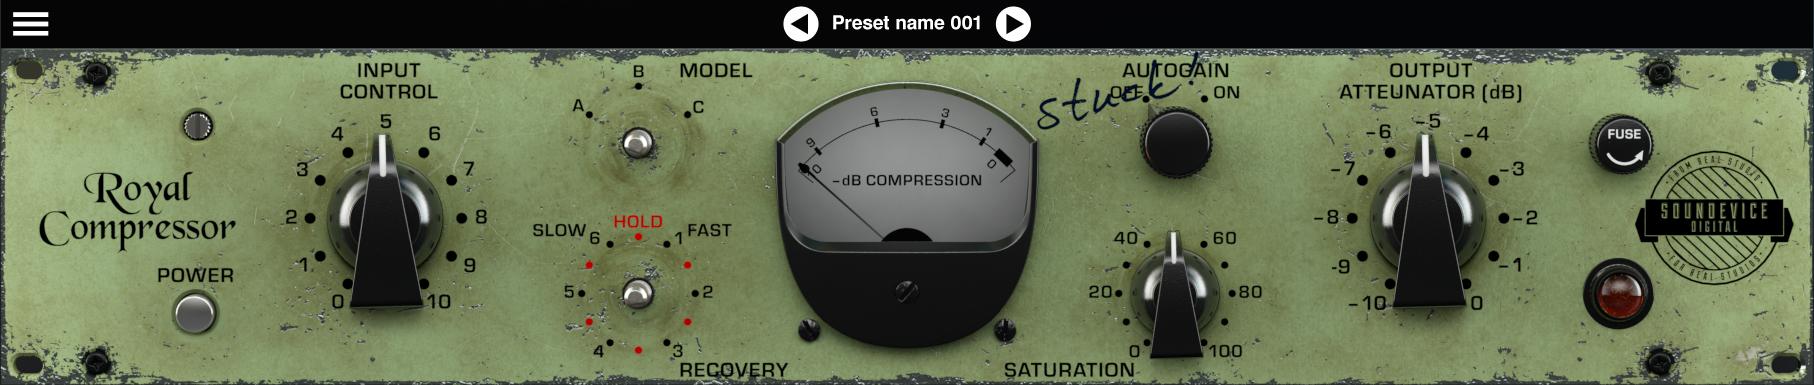 Royal Compressor | UnitedPlugins